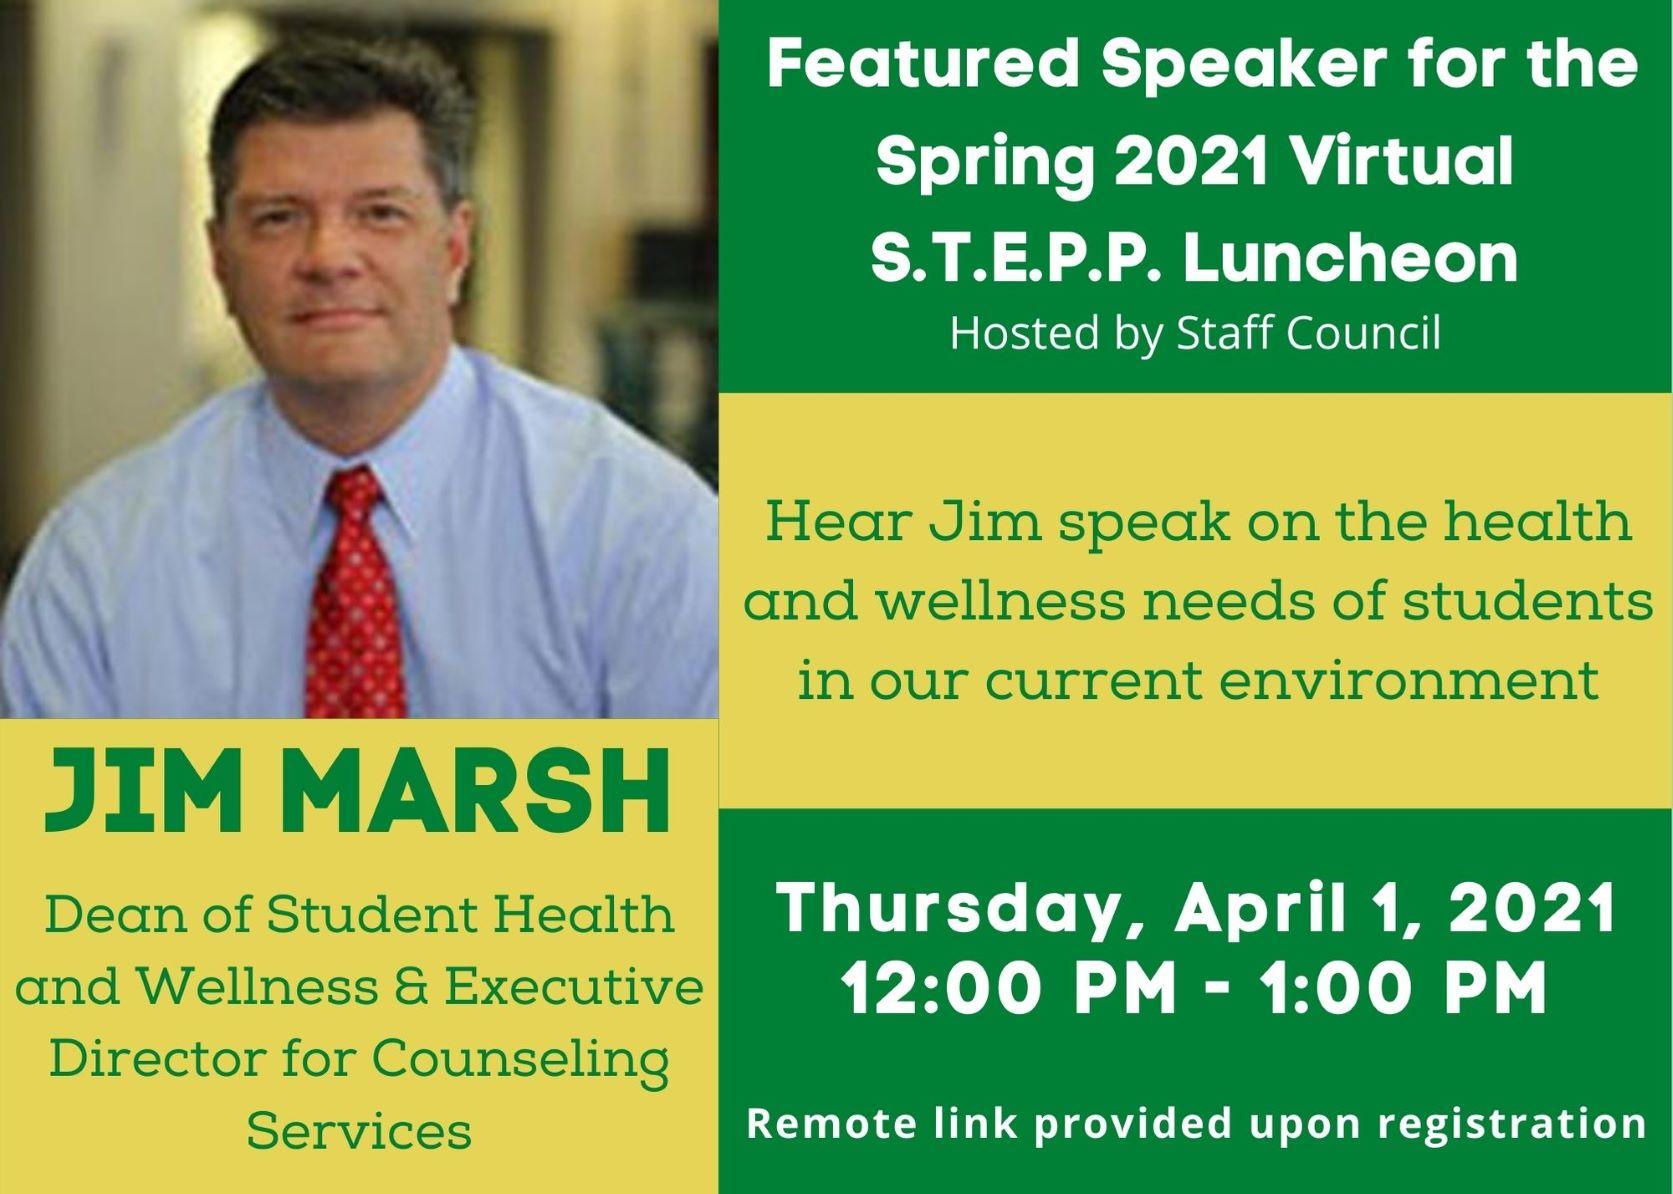 STEPP Luncheon April 1 2021